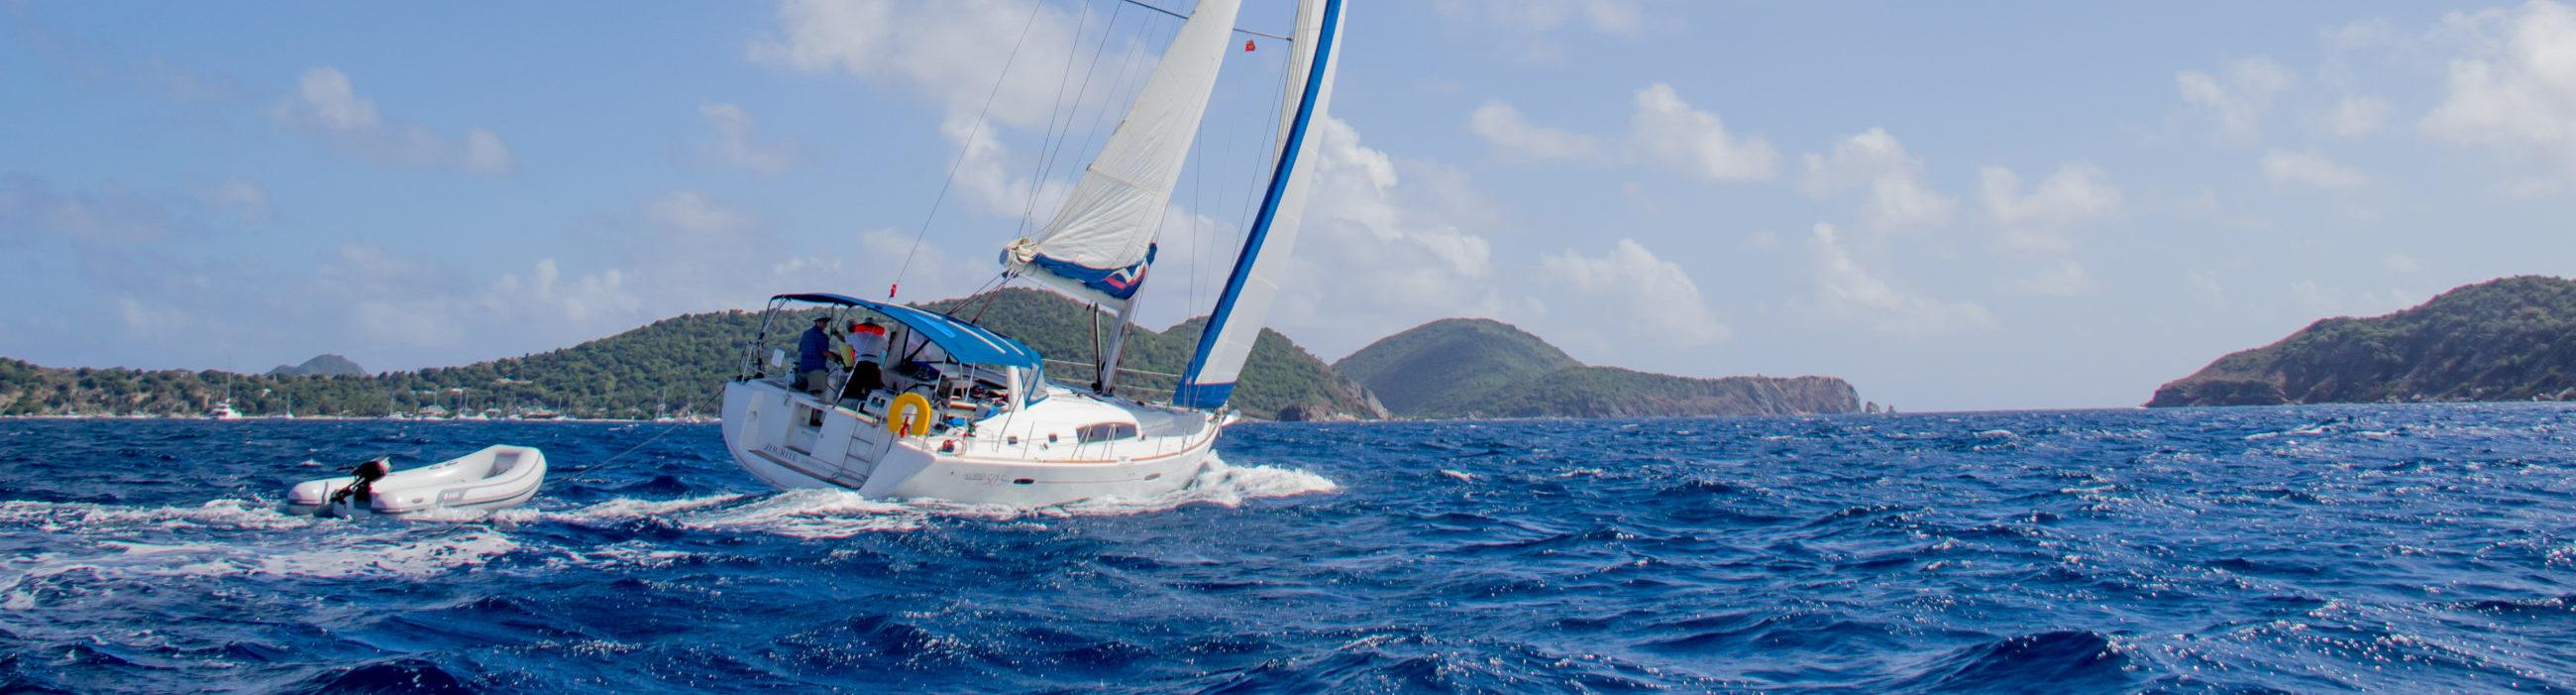 Learn to Sail Membership